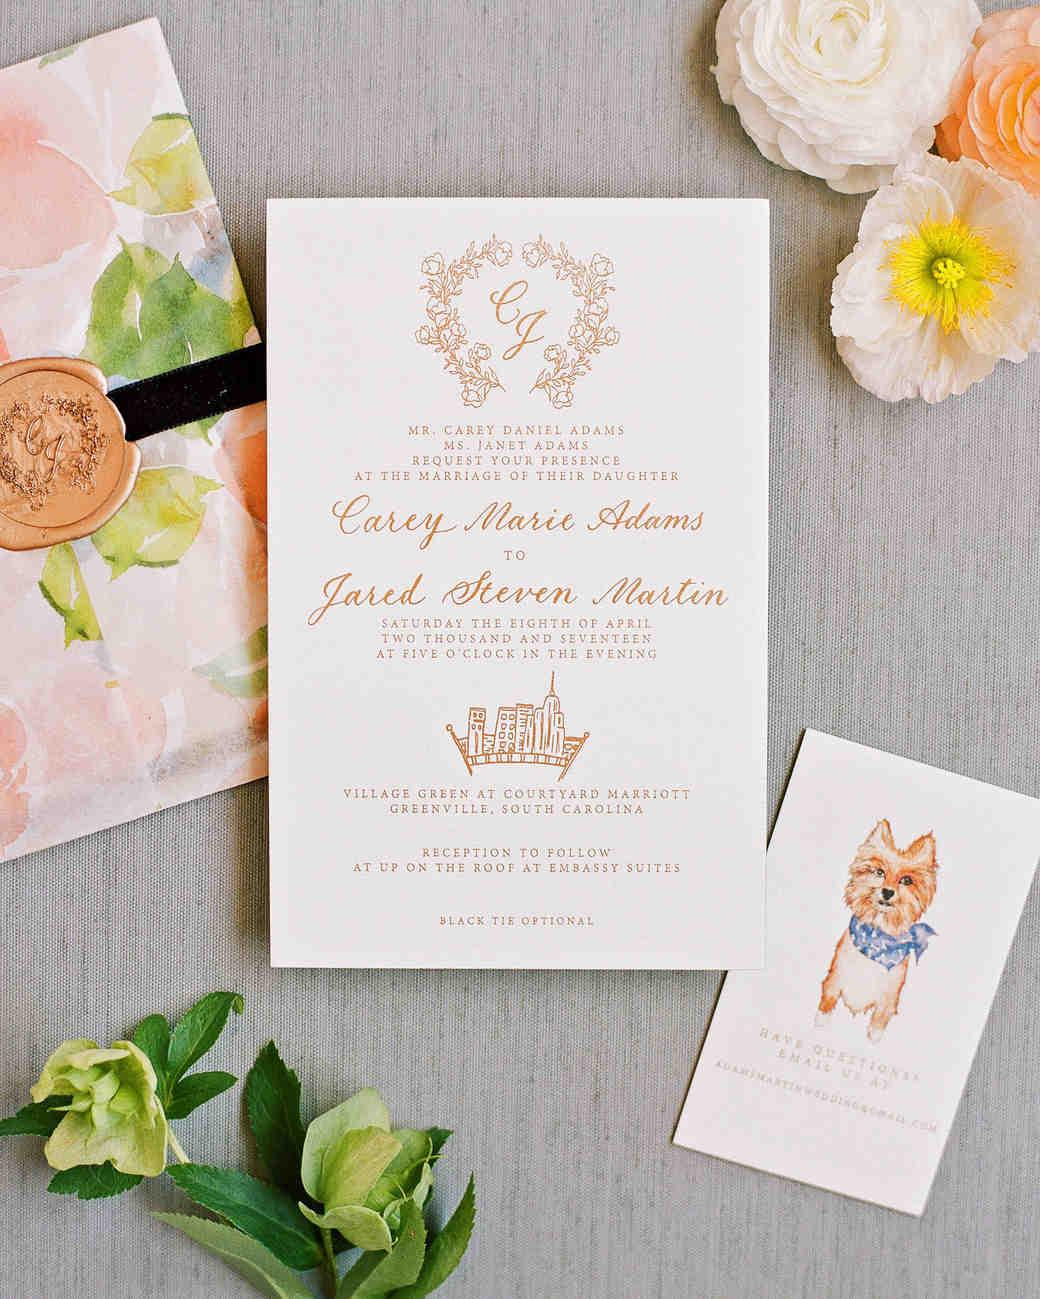 Carey Jared Wedding Invite Formal: Bird Themed Wedding Invitations At Reisefeber.org